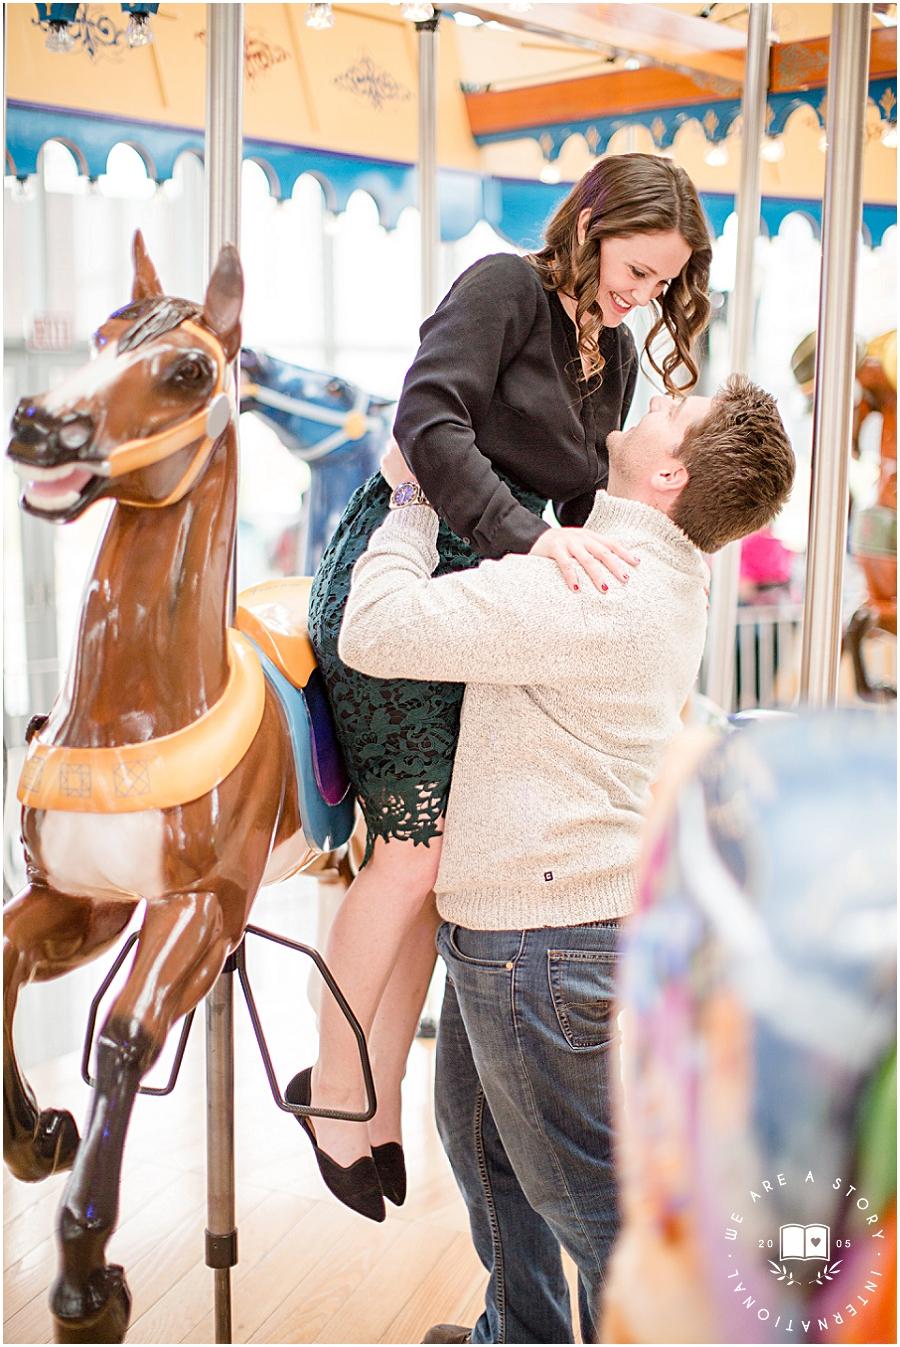 Cincinnati Wedding Photographer_We Are A Story_Molly & Matt Engagement Session_2522.jpg